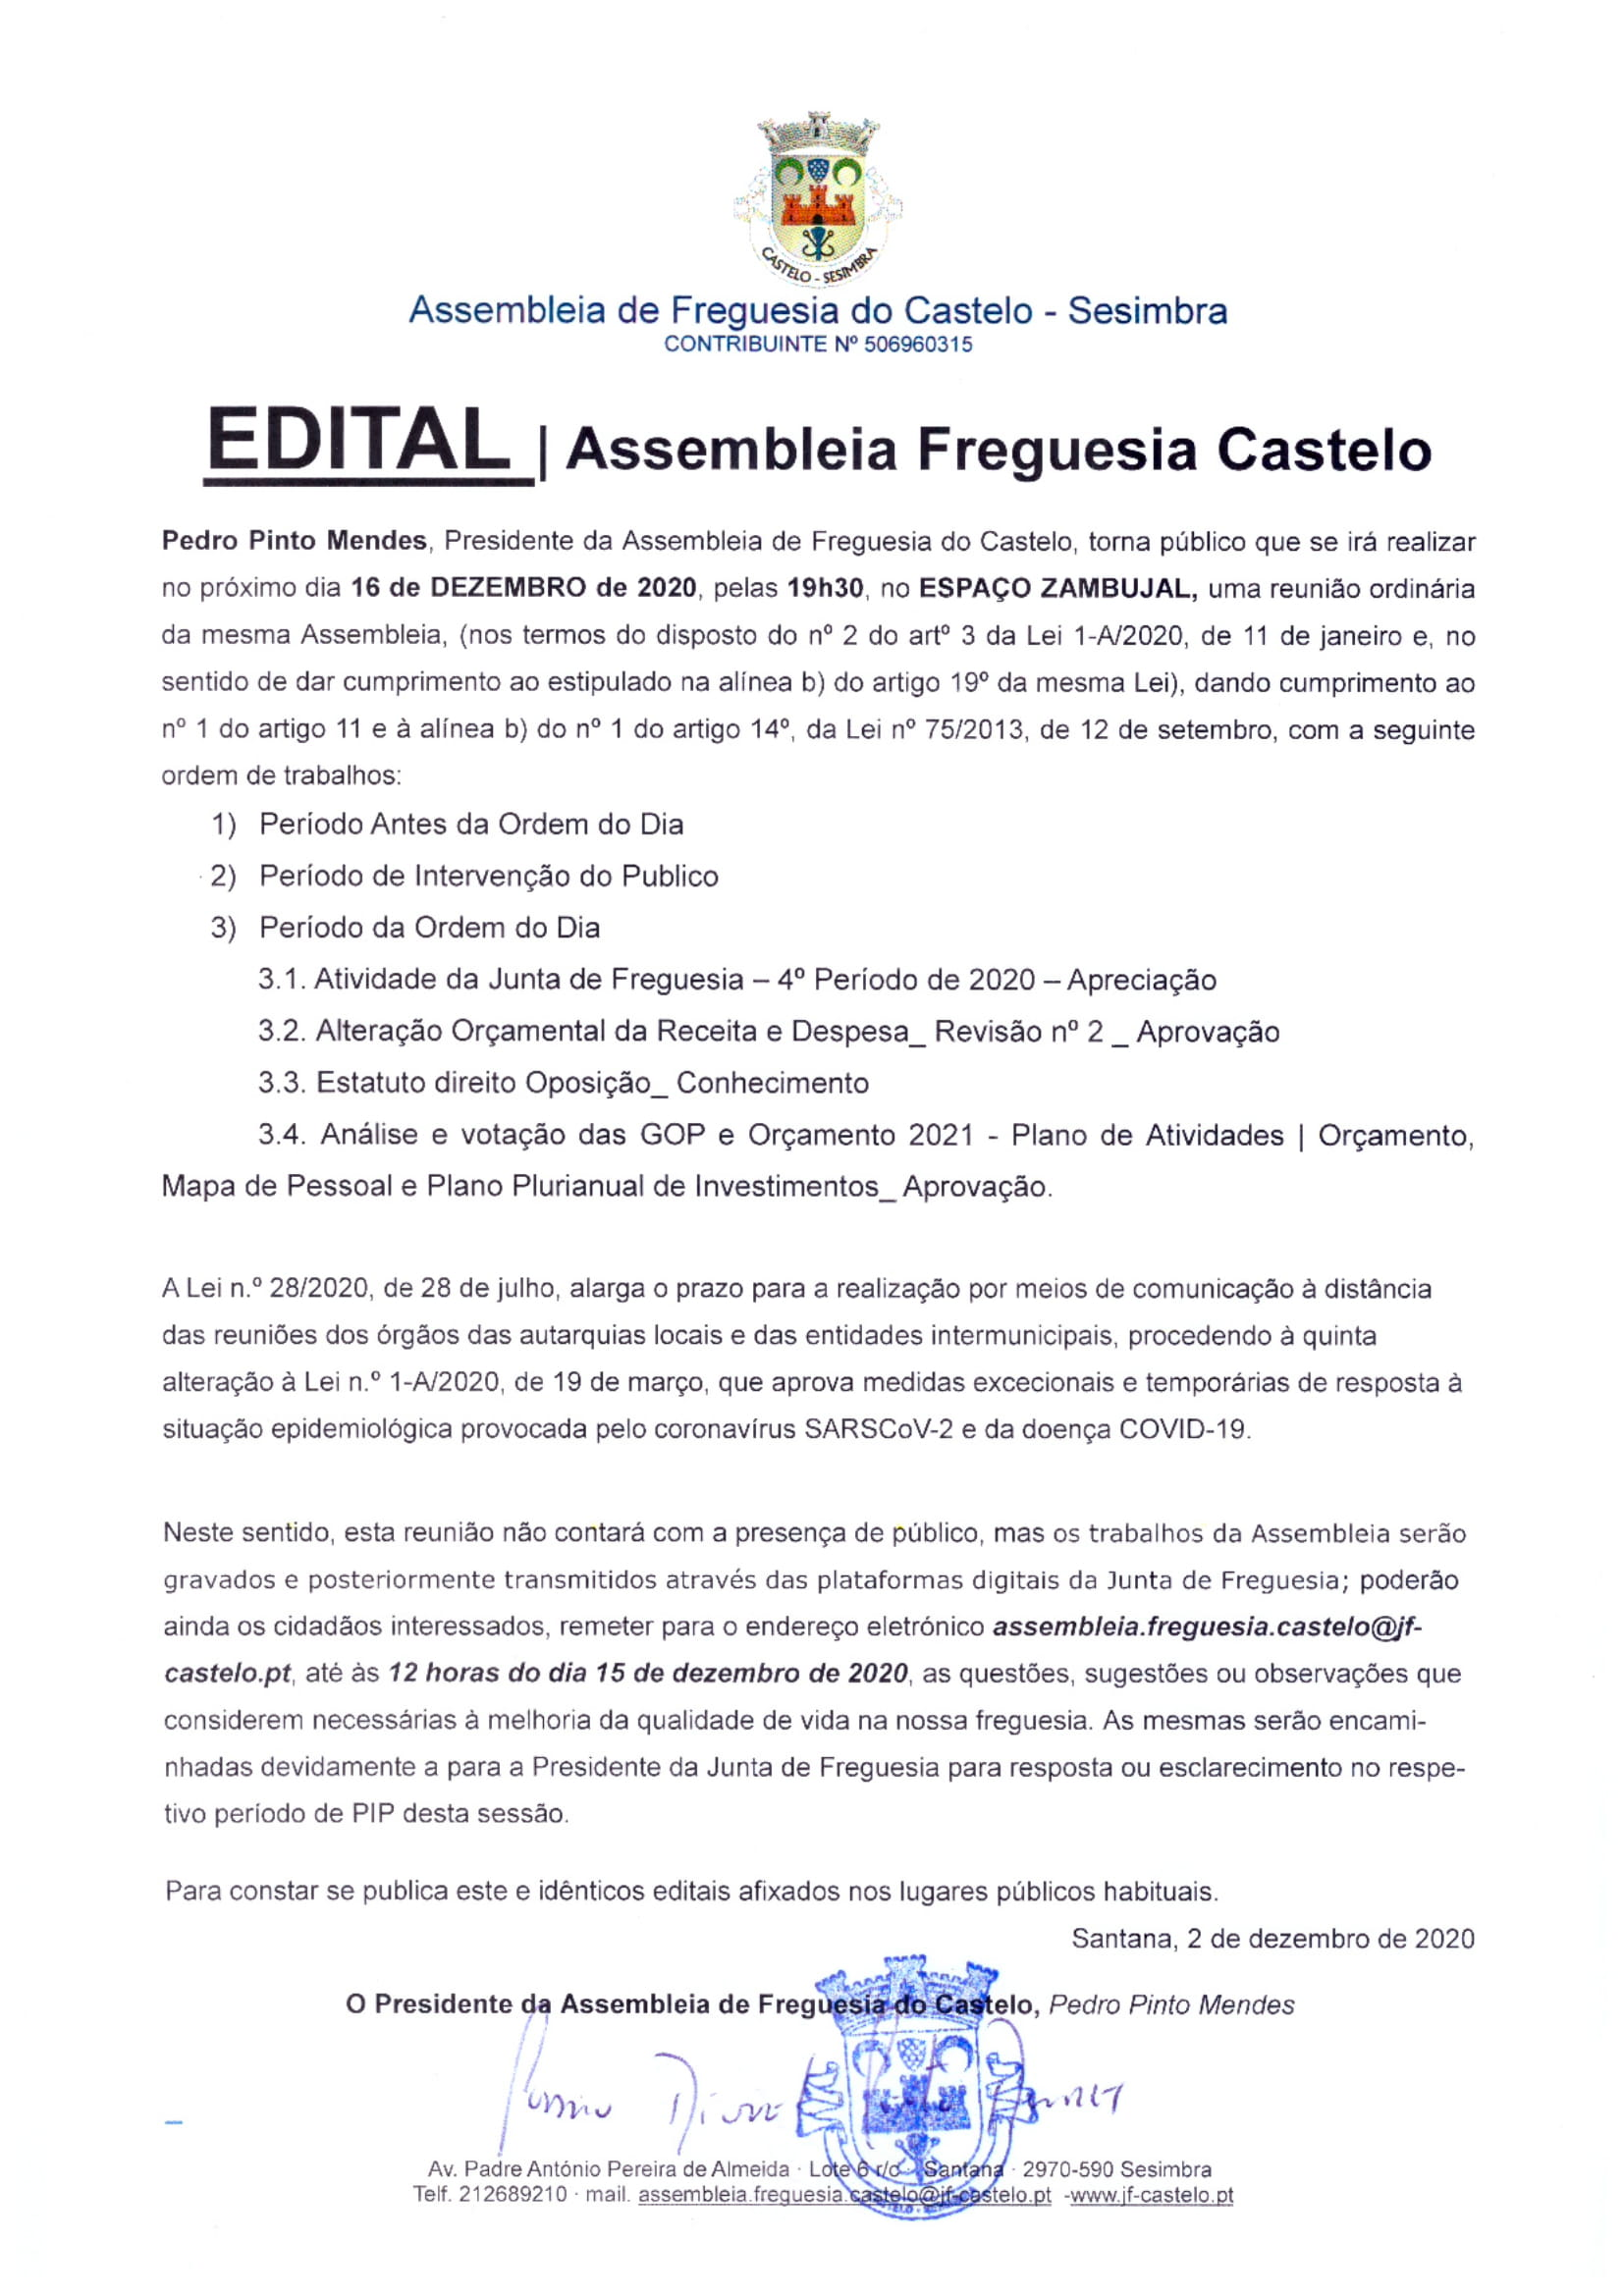 Assembleia de Freguesia | 16 DEZEMBRO | Espaço Zambujal